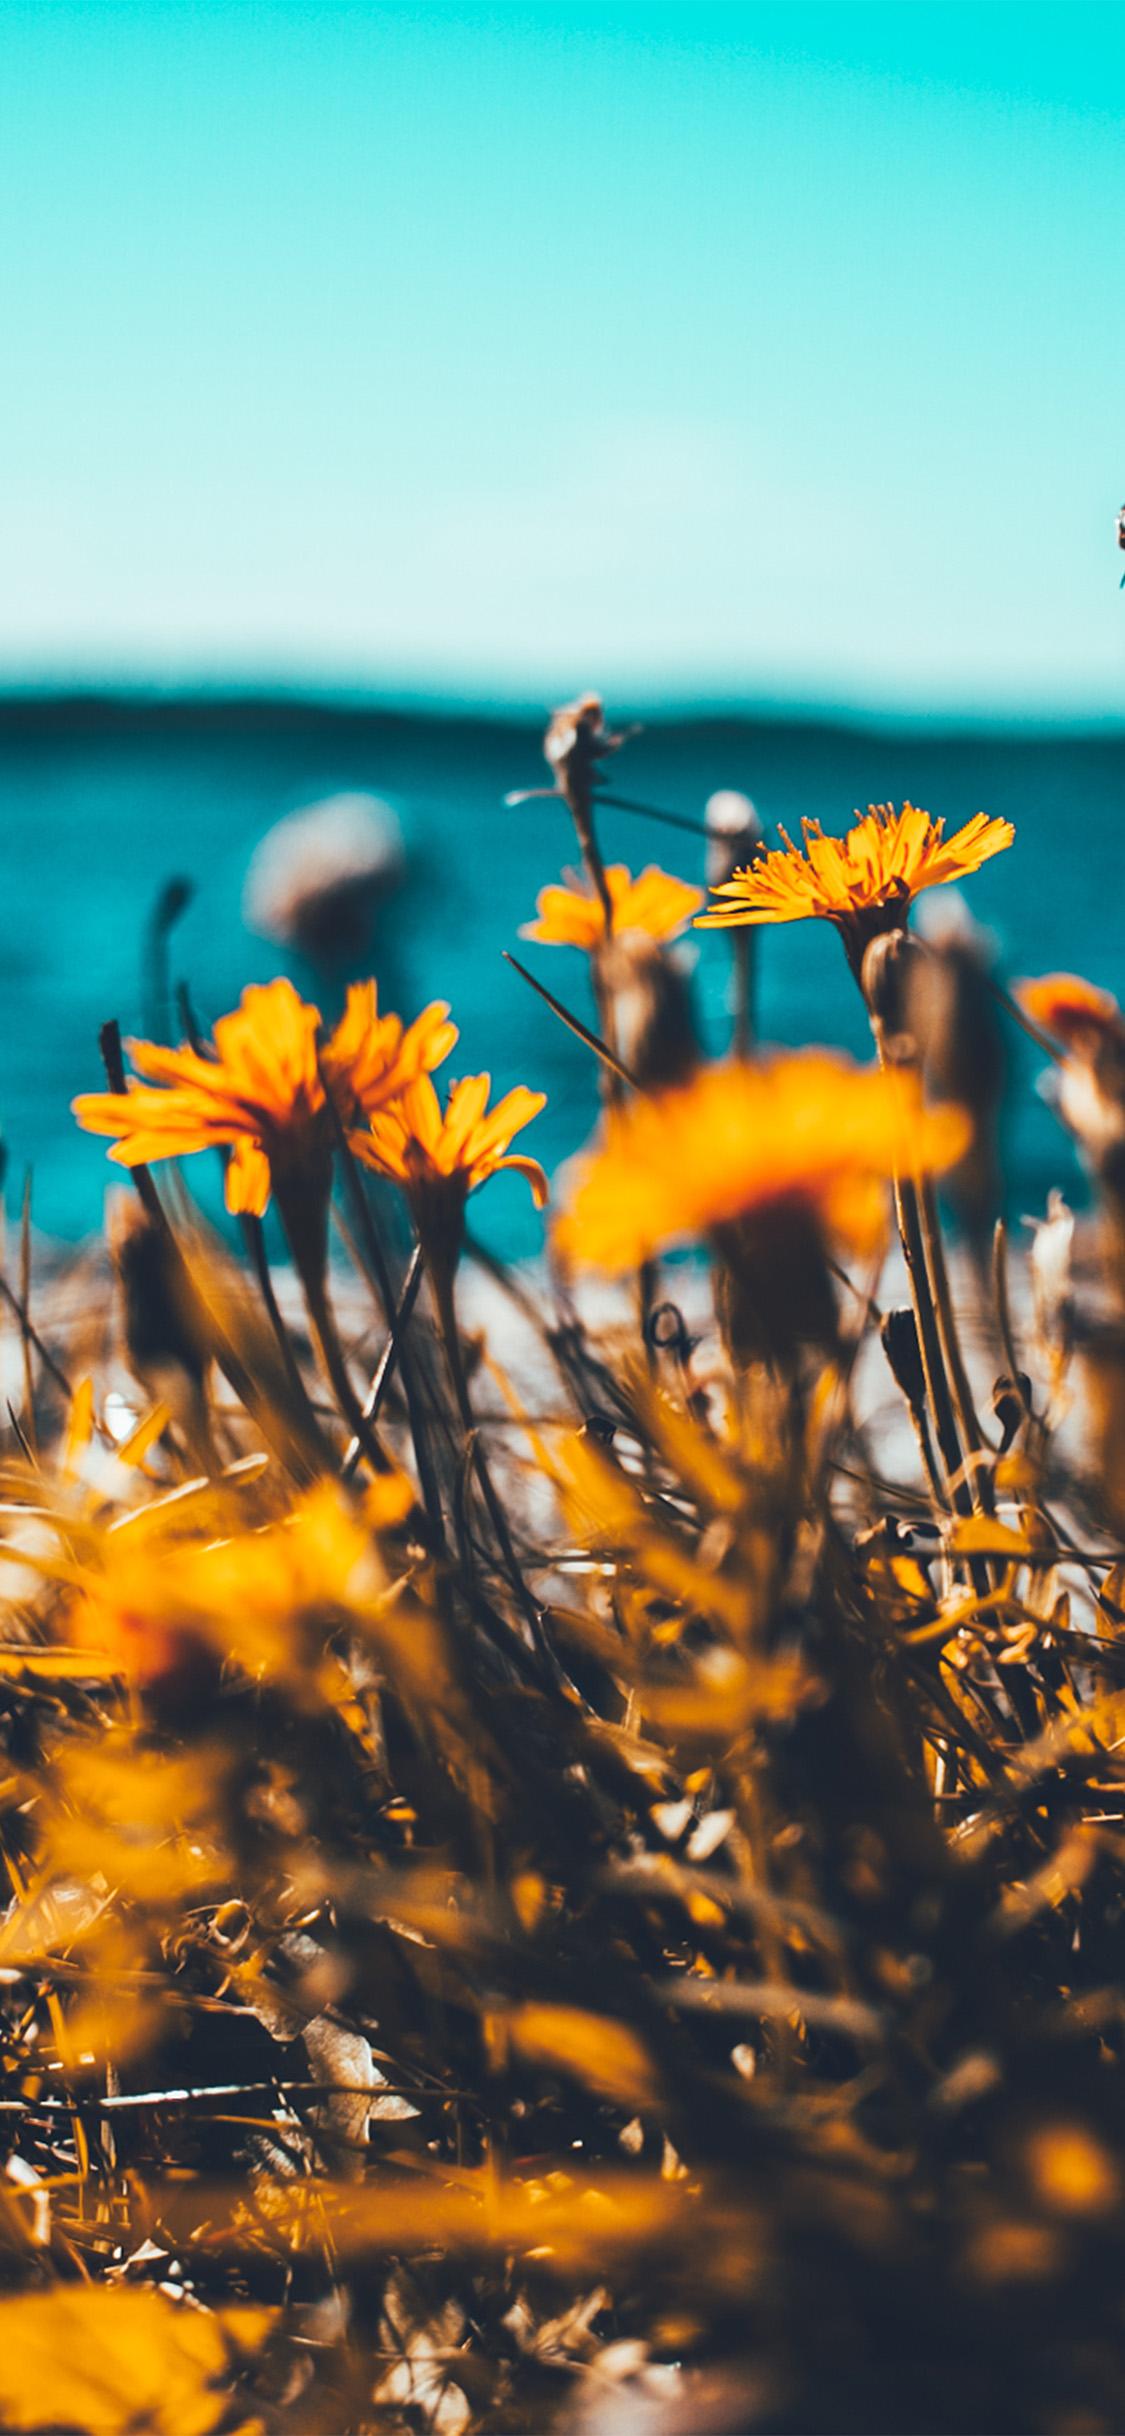 Iphonexpapers Com Iphone X Wallpaper Nu64 Flower Summer Spring